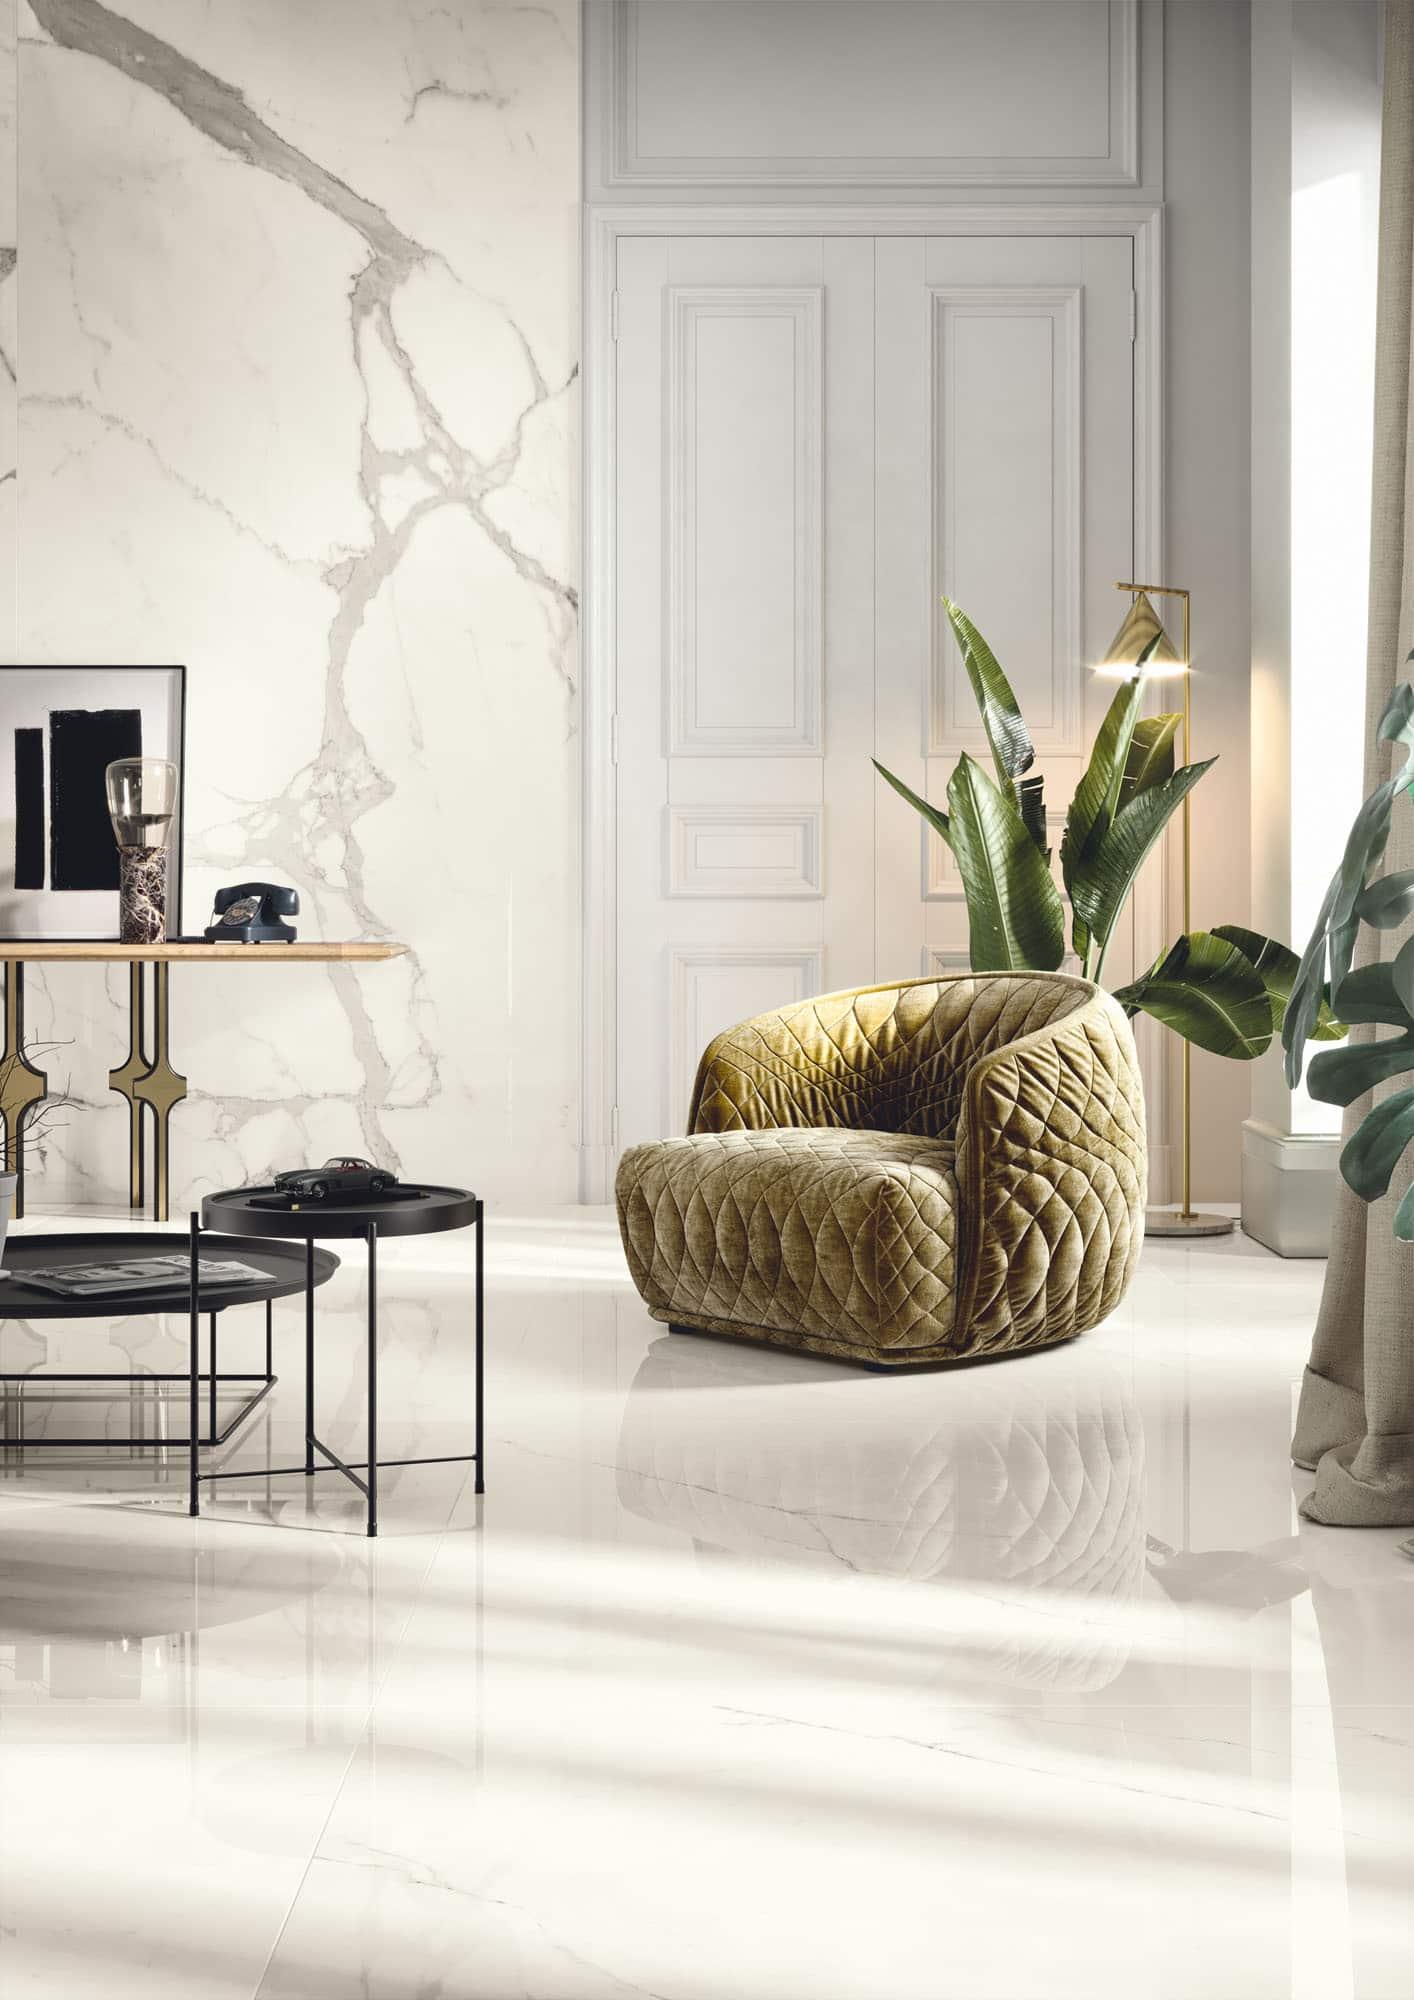 Wandtegels 60x120 - Vanity Bianco Statuario - Glossy